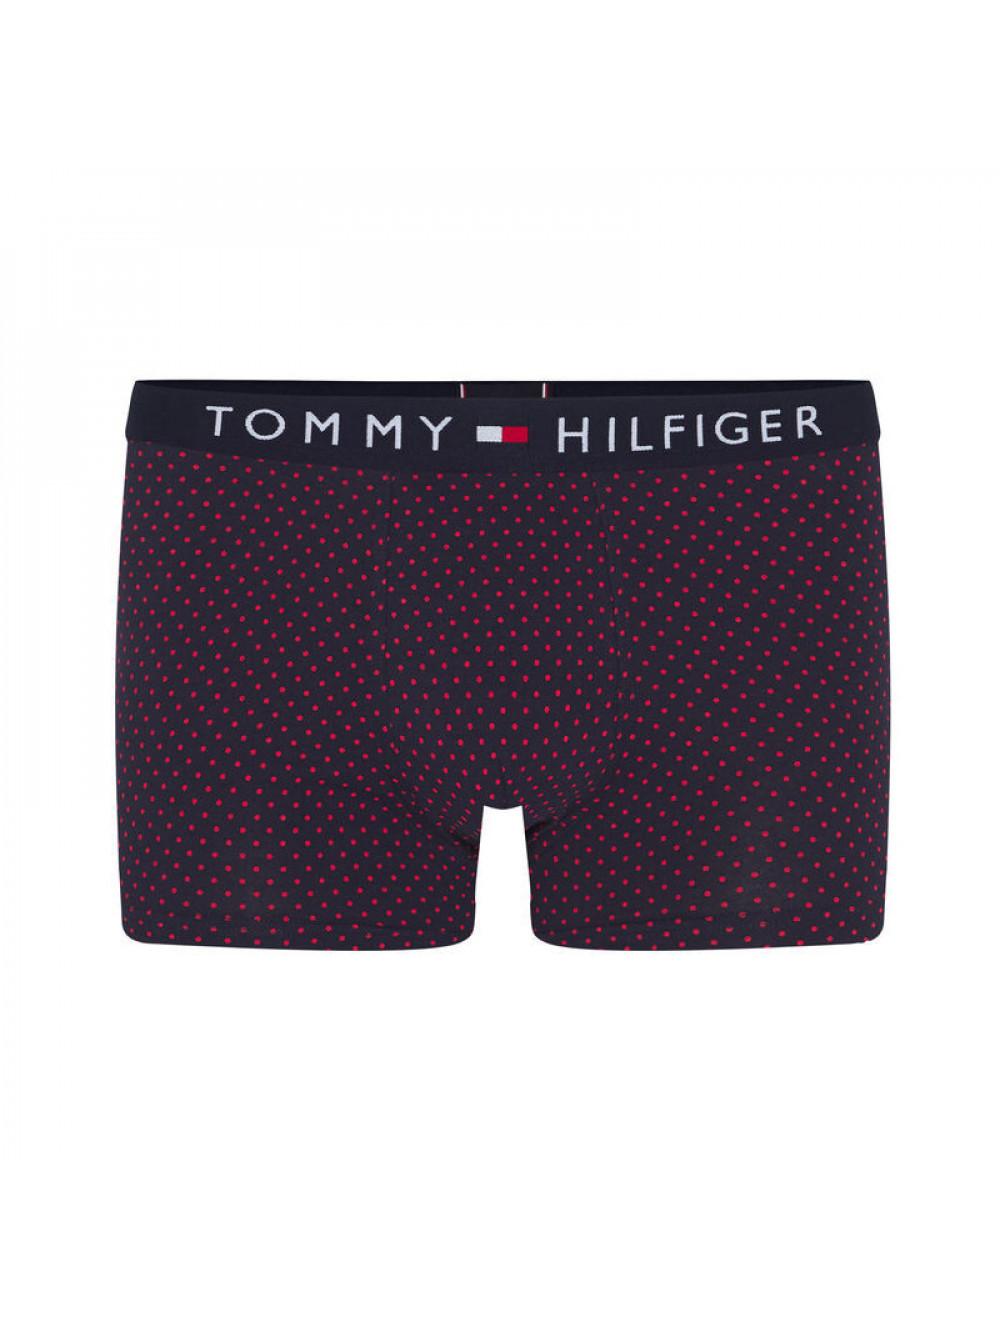 Férfi boxeralsó Tommy Hilfiger All-Over Print Cotton Trunks fekete mintás